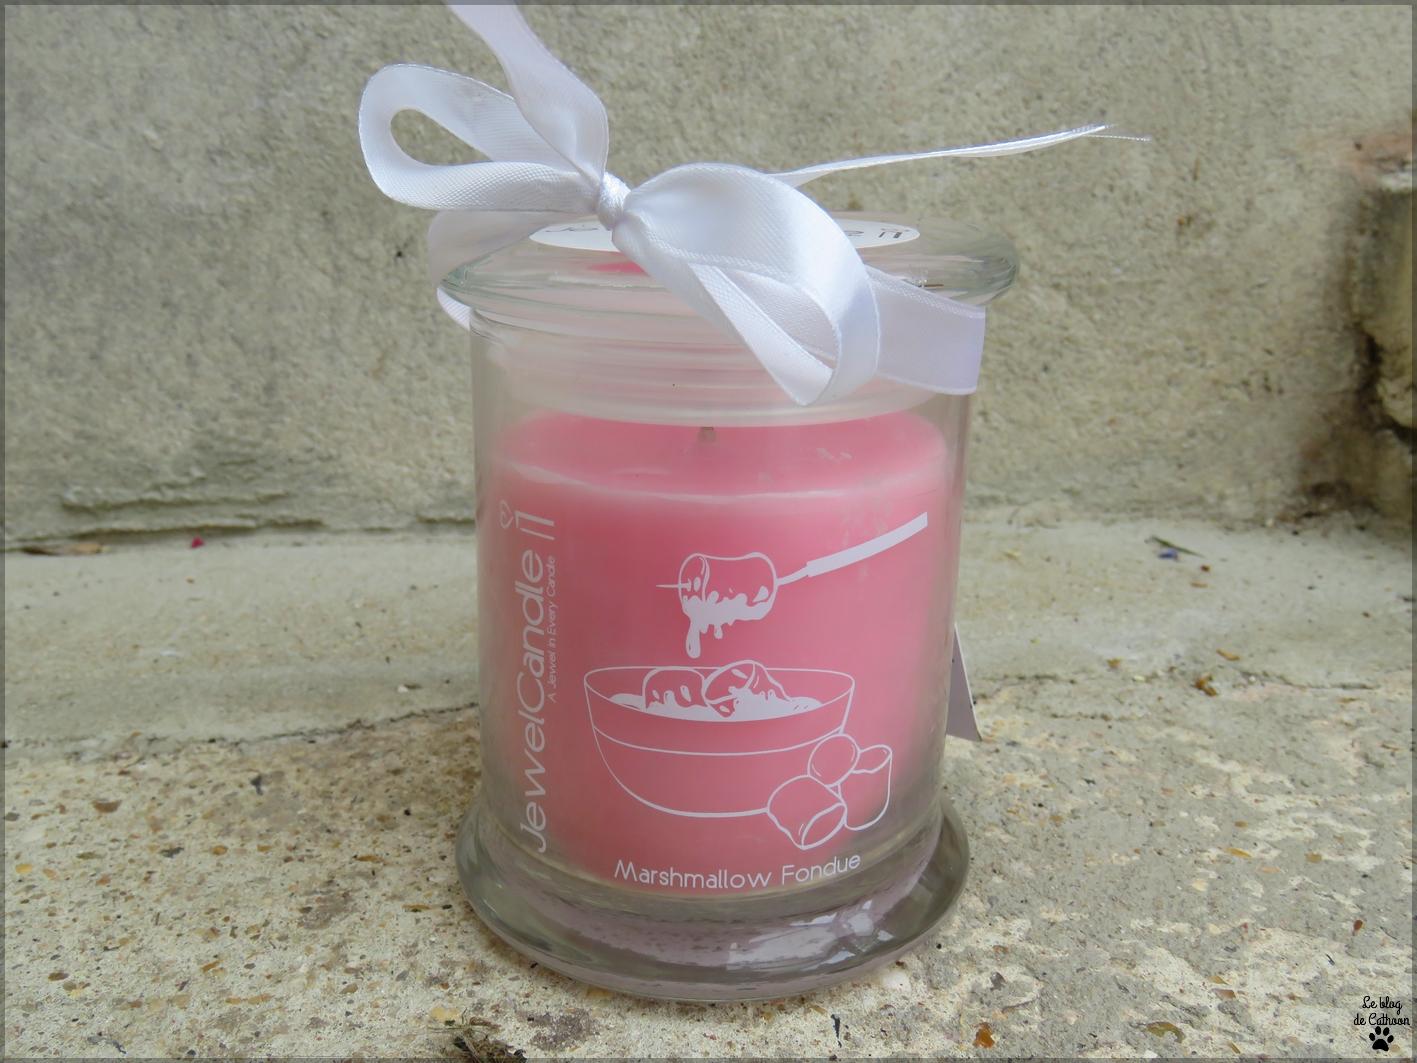 Marshmallow Fondue Jewel Candle